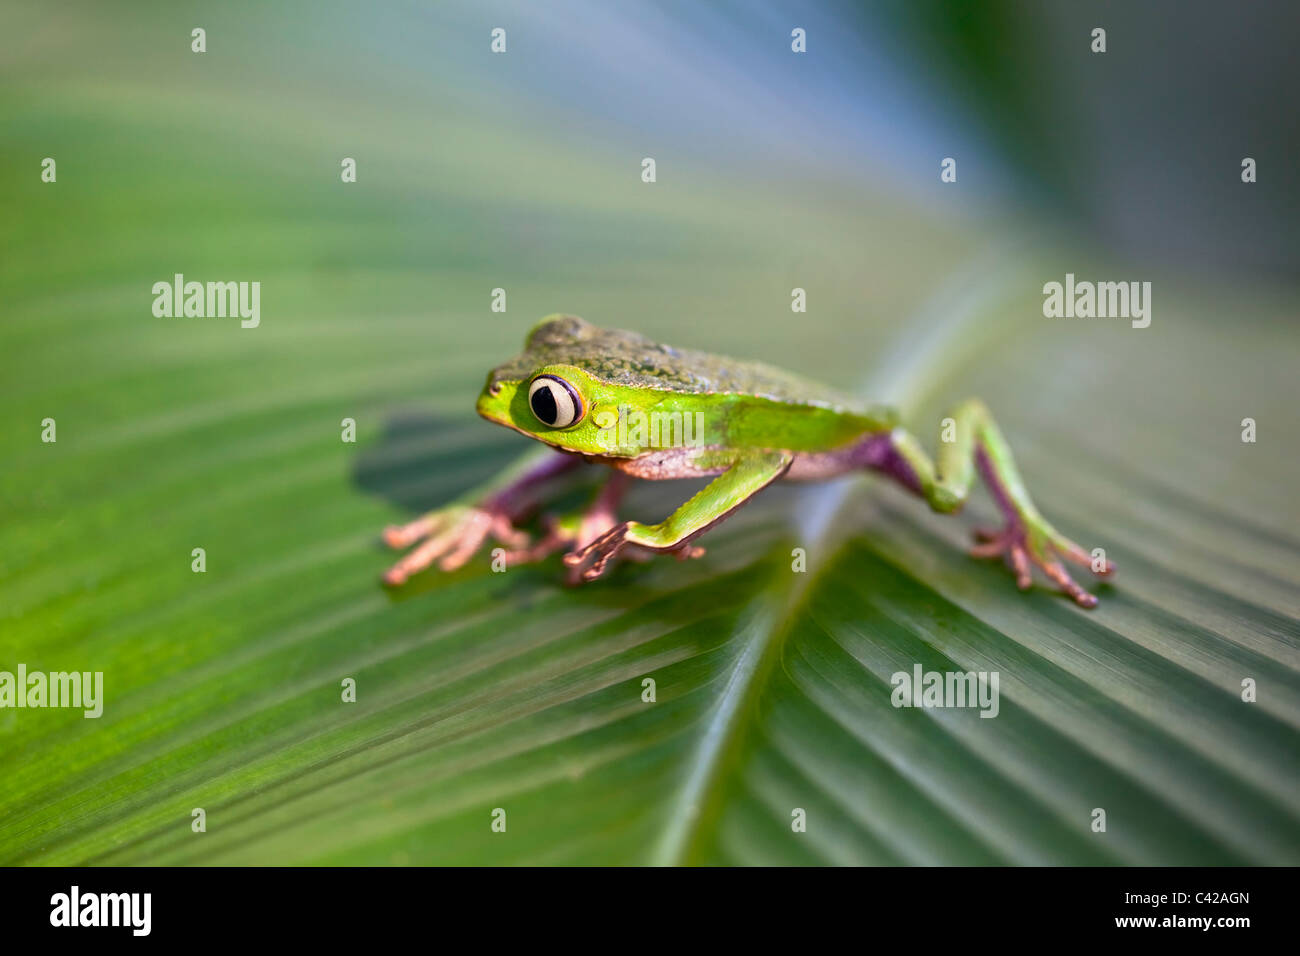 Peru, Cruz de Mayo, Manu National Park, Pantiacolla mountains. White lined leaf frog ( (Phyllomedusa vaillanti ). - Stock Image